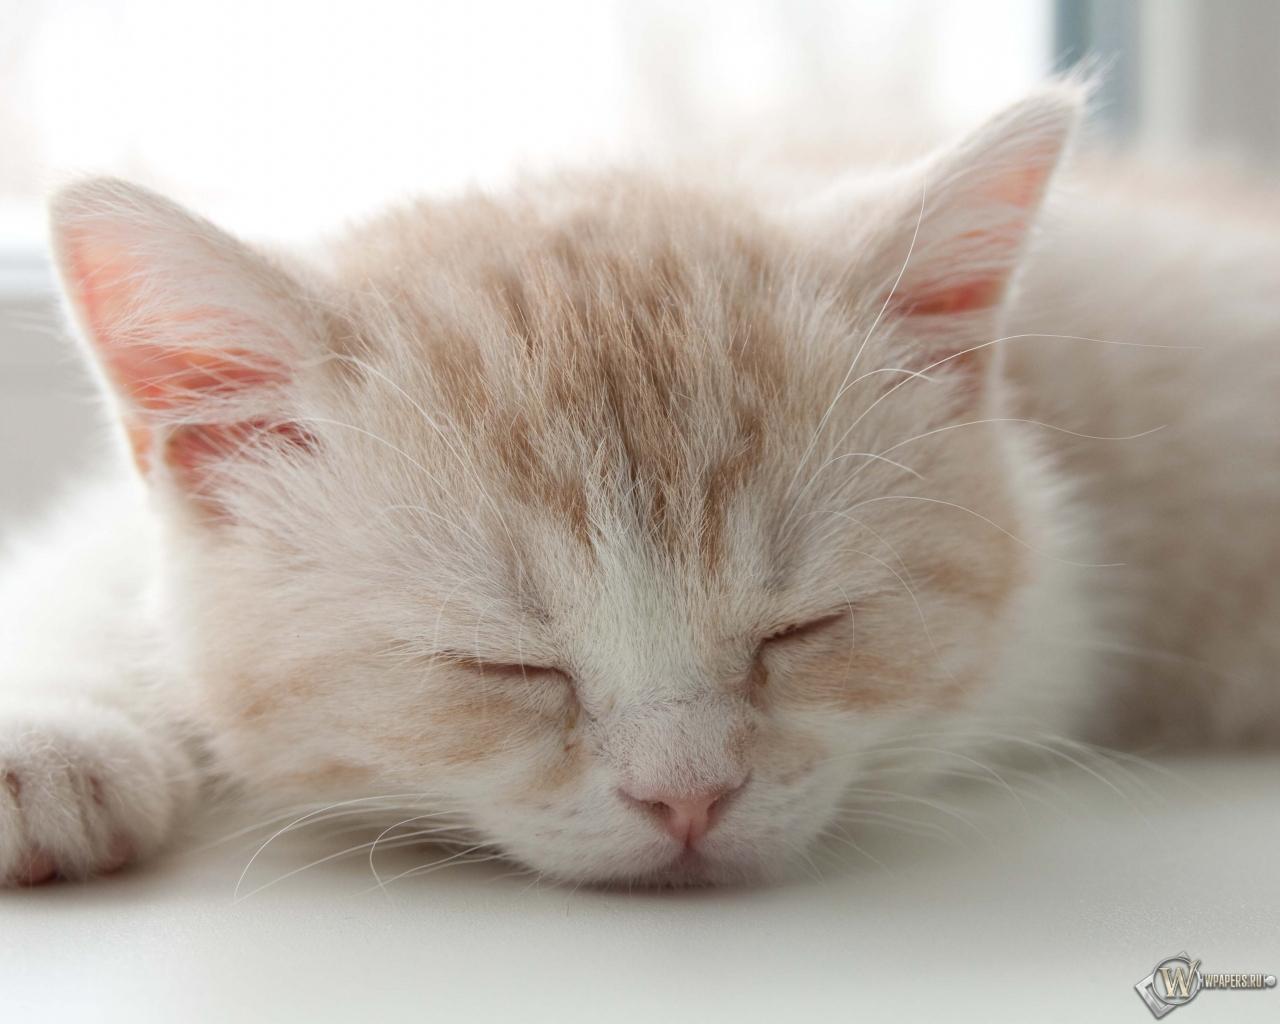 Котёнок спит 1280x1024